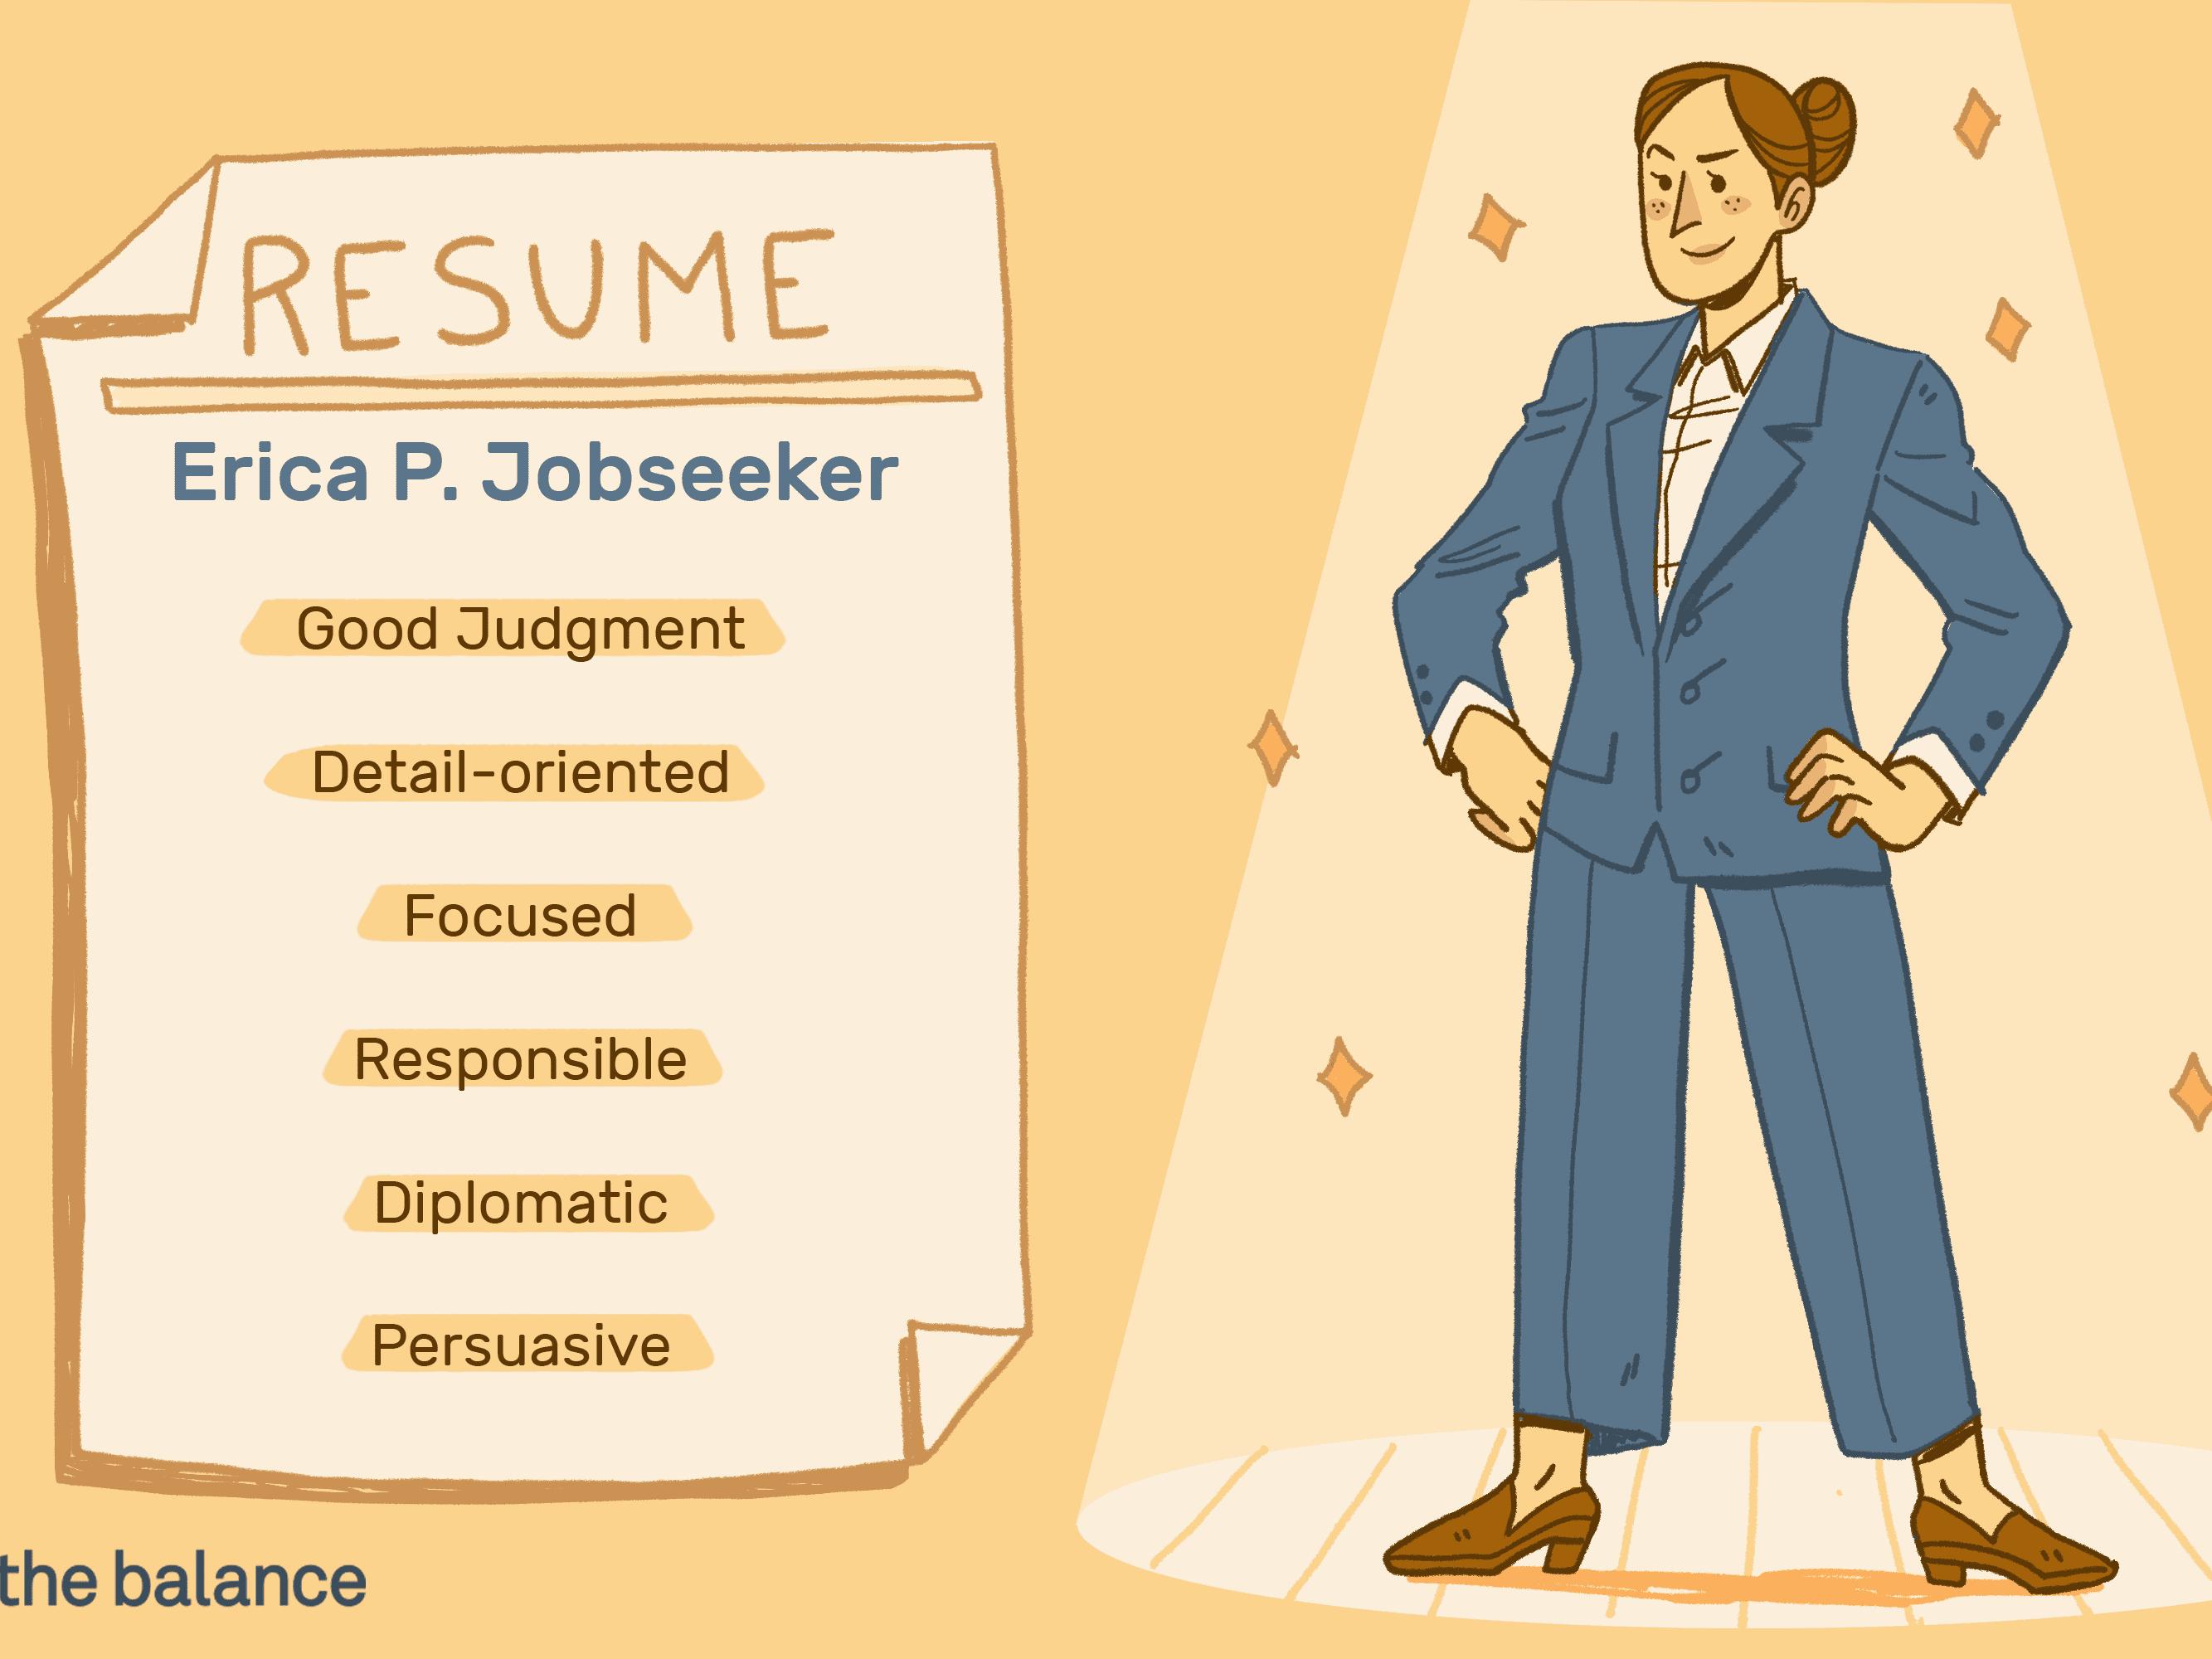 resume-strengths-list-2063804-Final-05ac2262a8094bda801a994850ac78ab